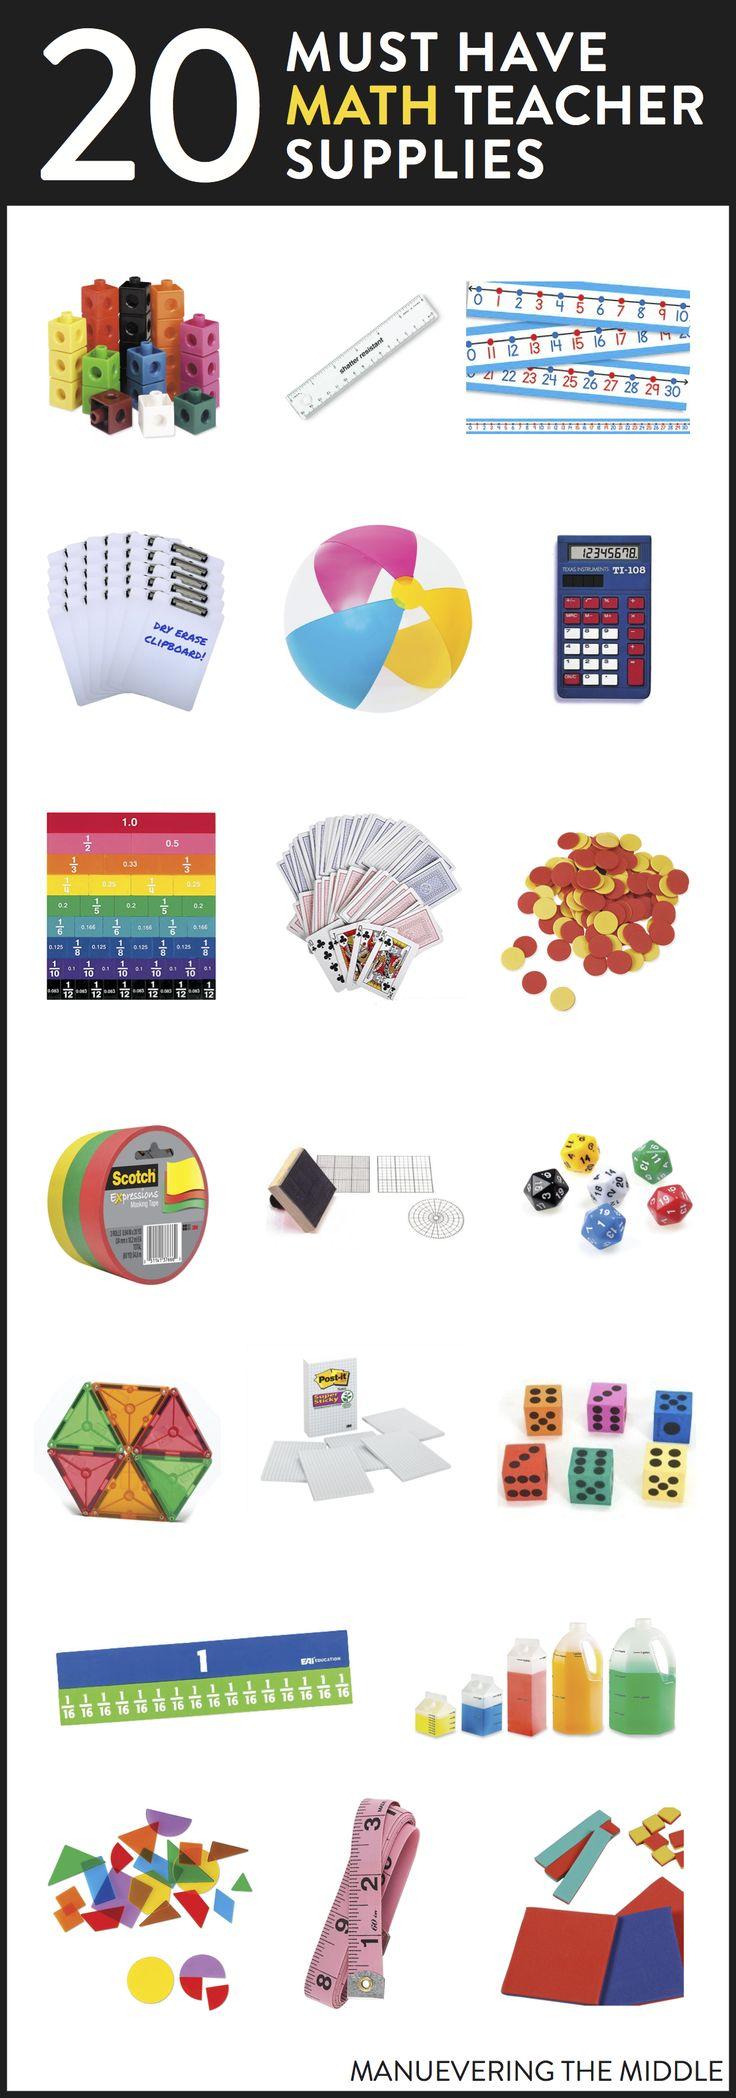 20 Supplies for the math classroom. - Must have math teacher supplies to stock your classroom! | maneuveringthemiddle.com via @maneveringthem